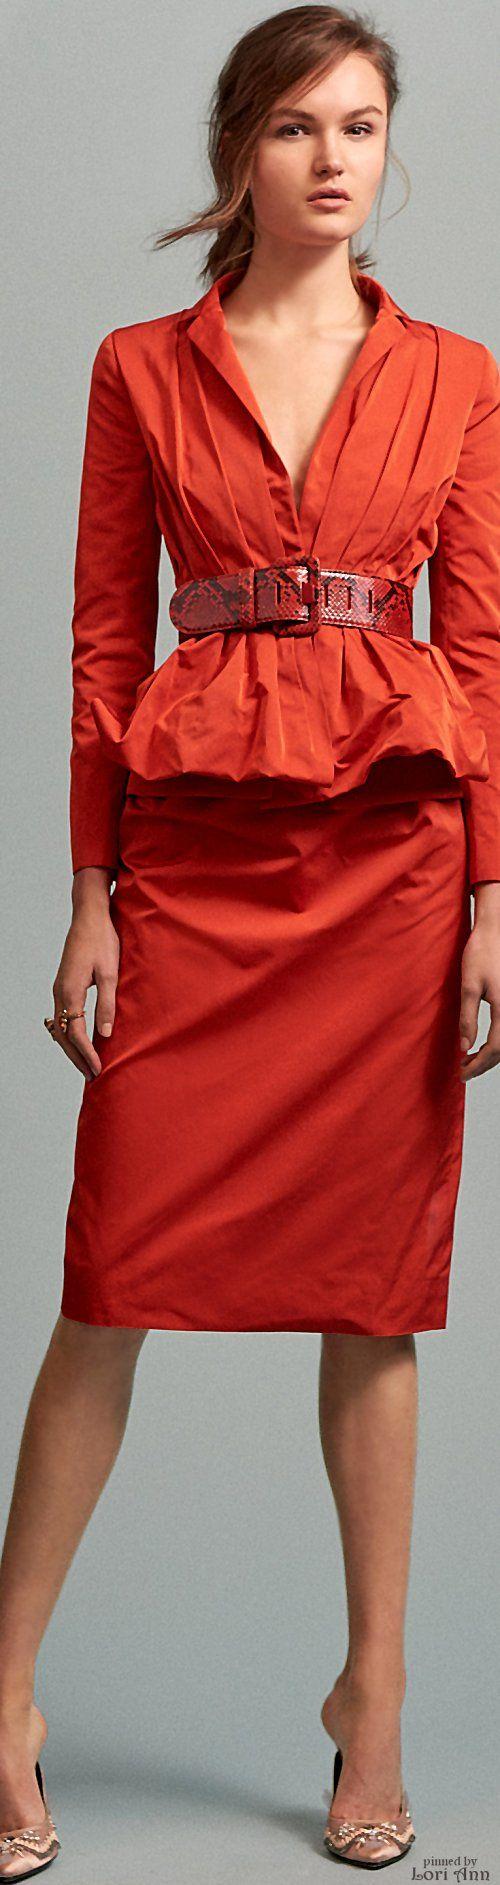 Oscar de la Renta Pre-Fall 2016 orange dress women fashion outfit clothing style apparel @roressclothes closet ideas